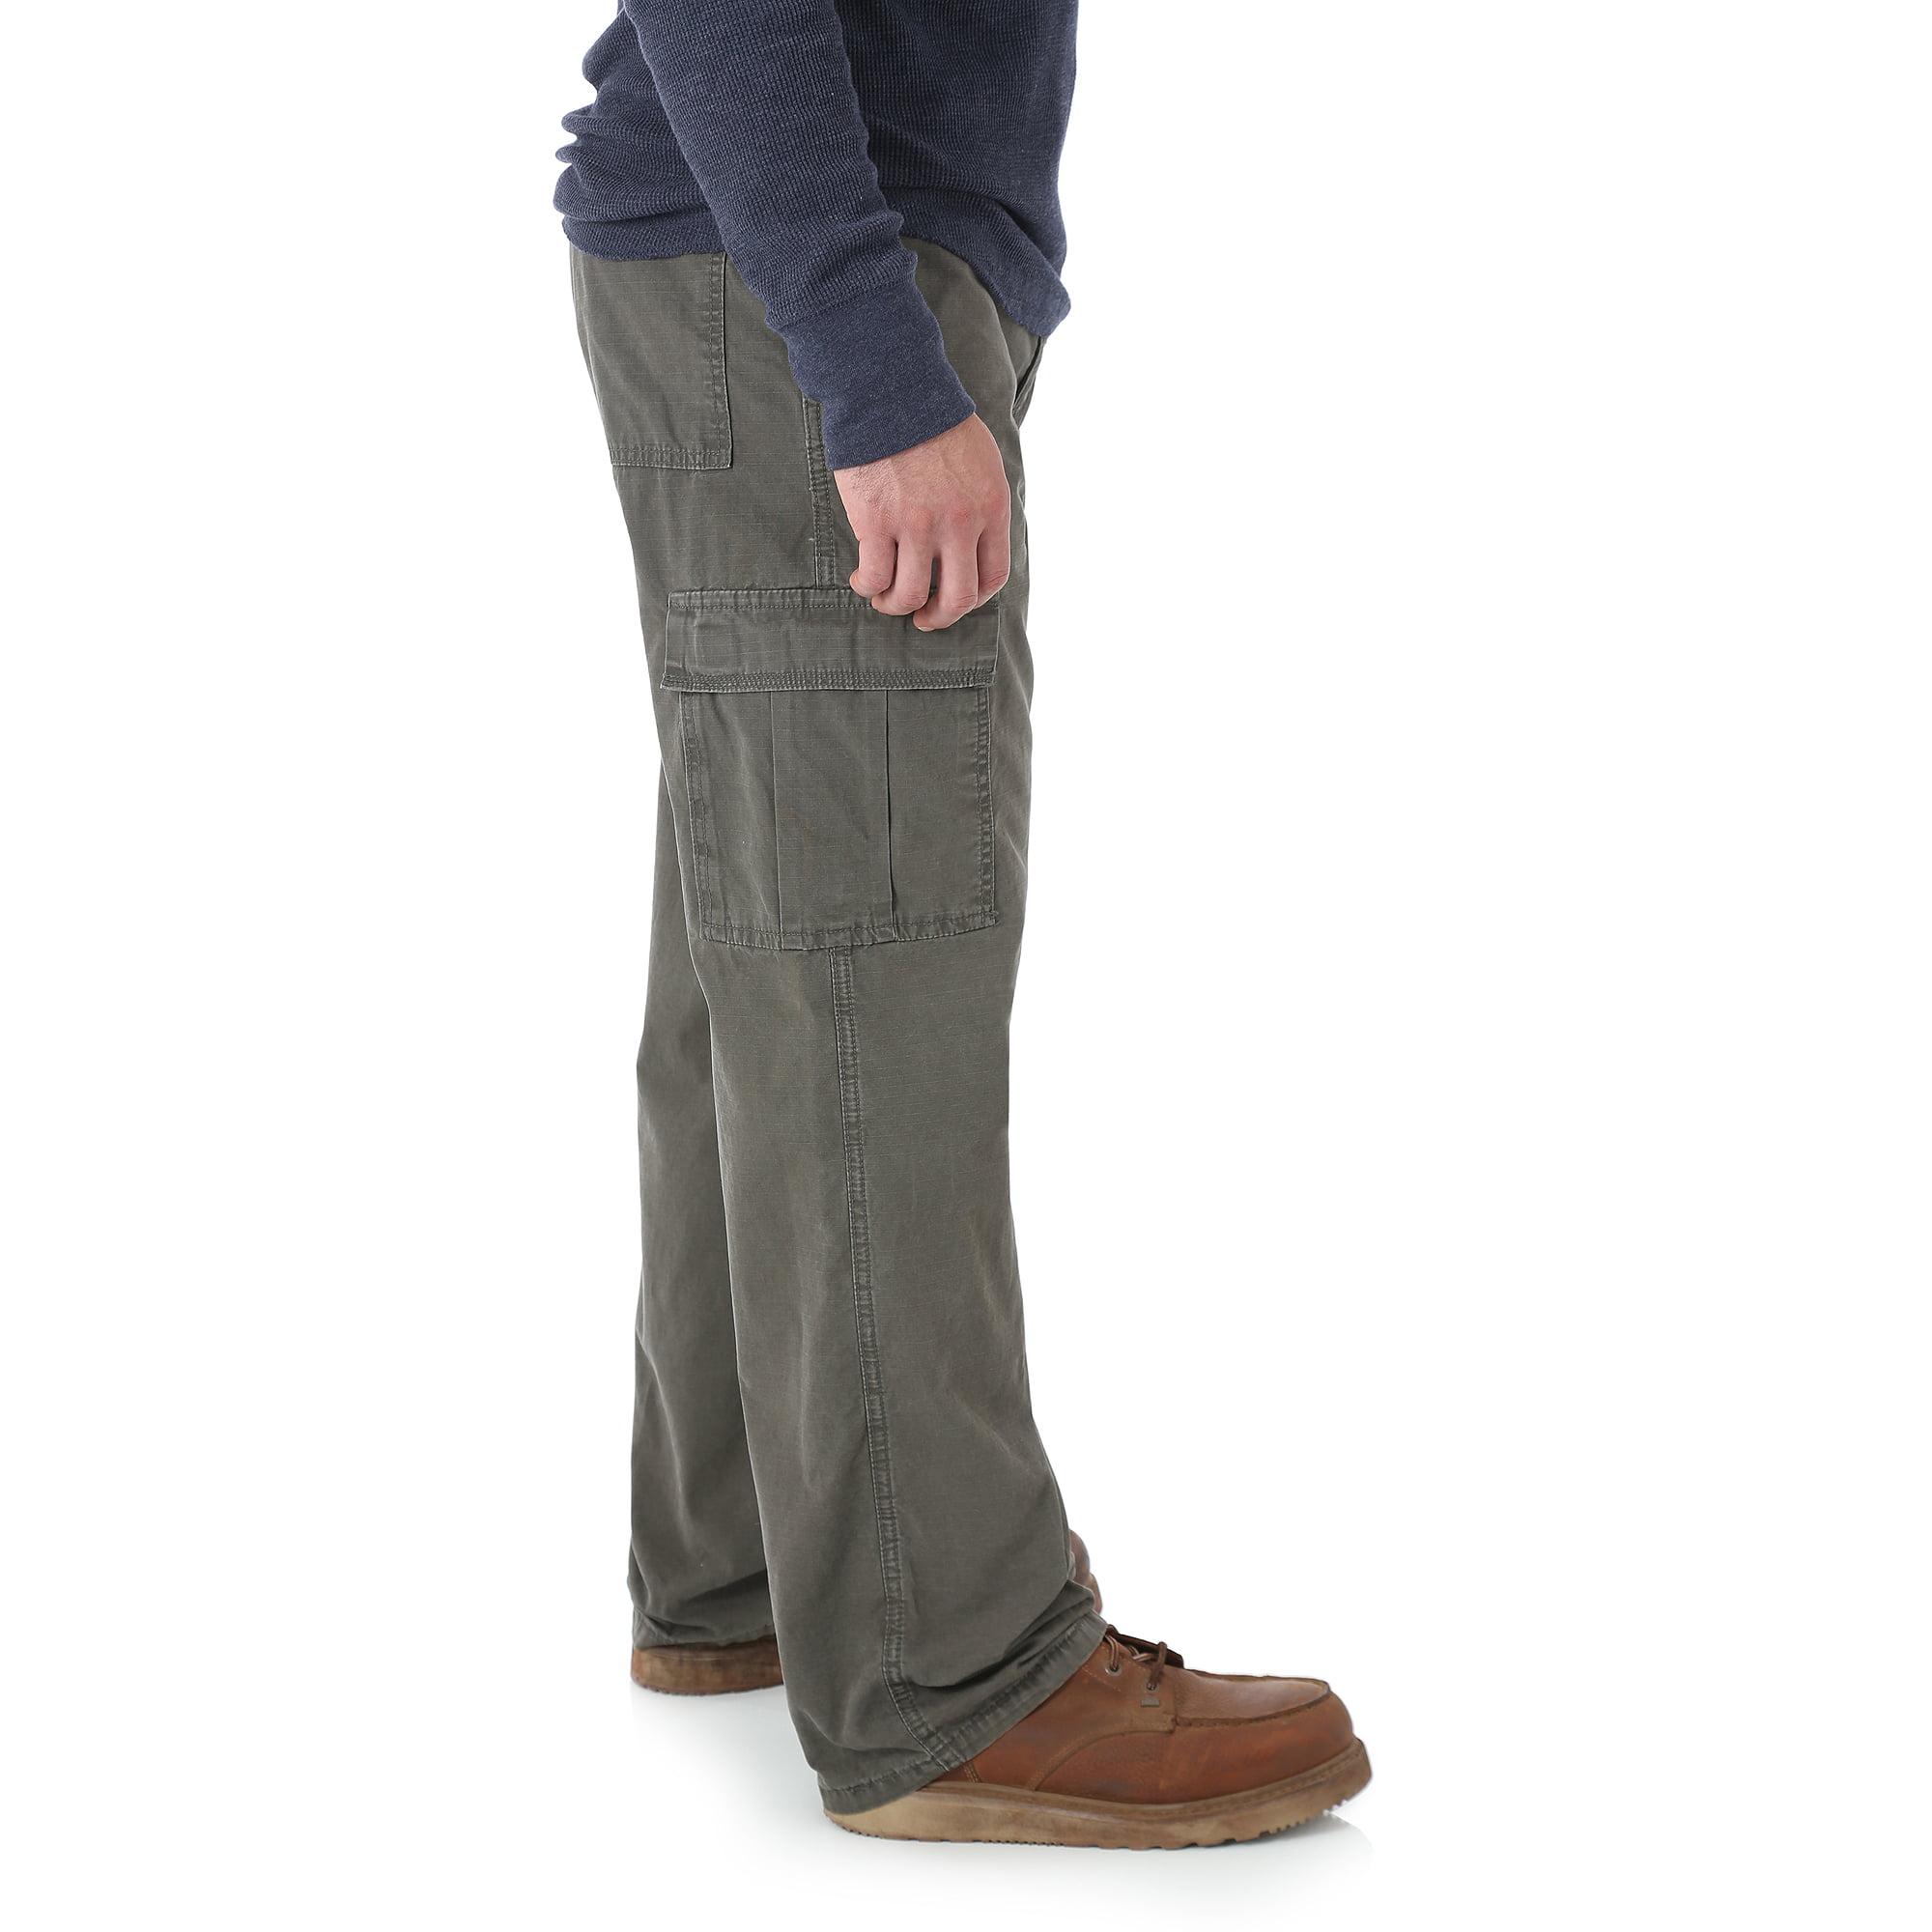 Name Brand Cargo Pants - White Pants 2016